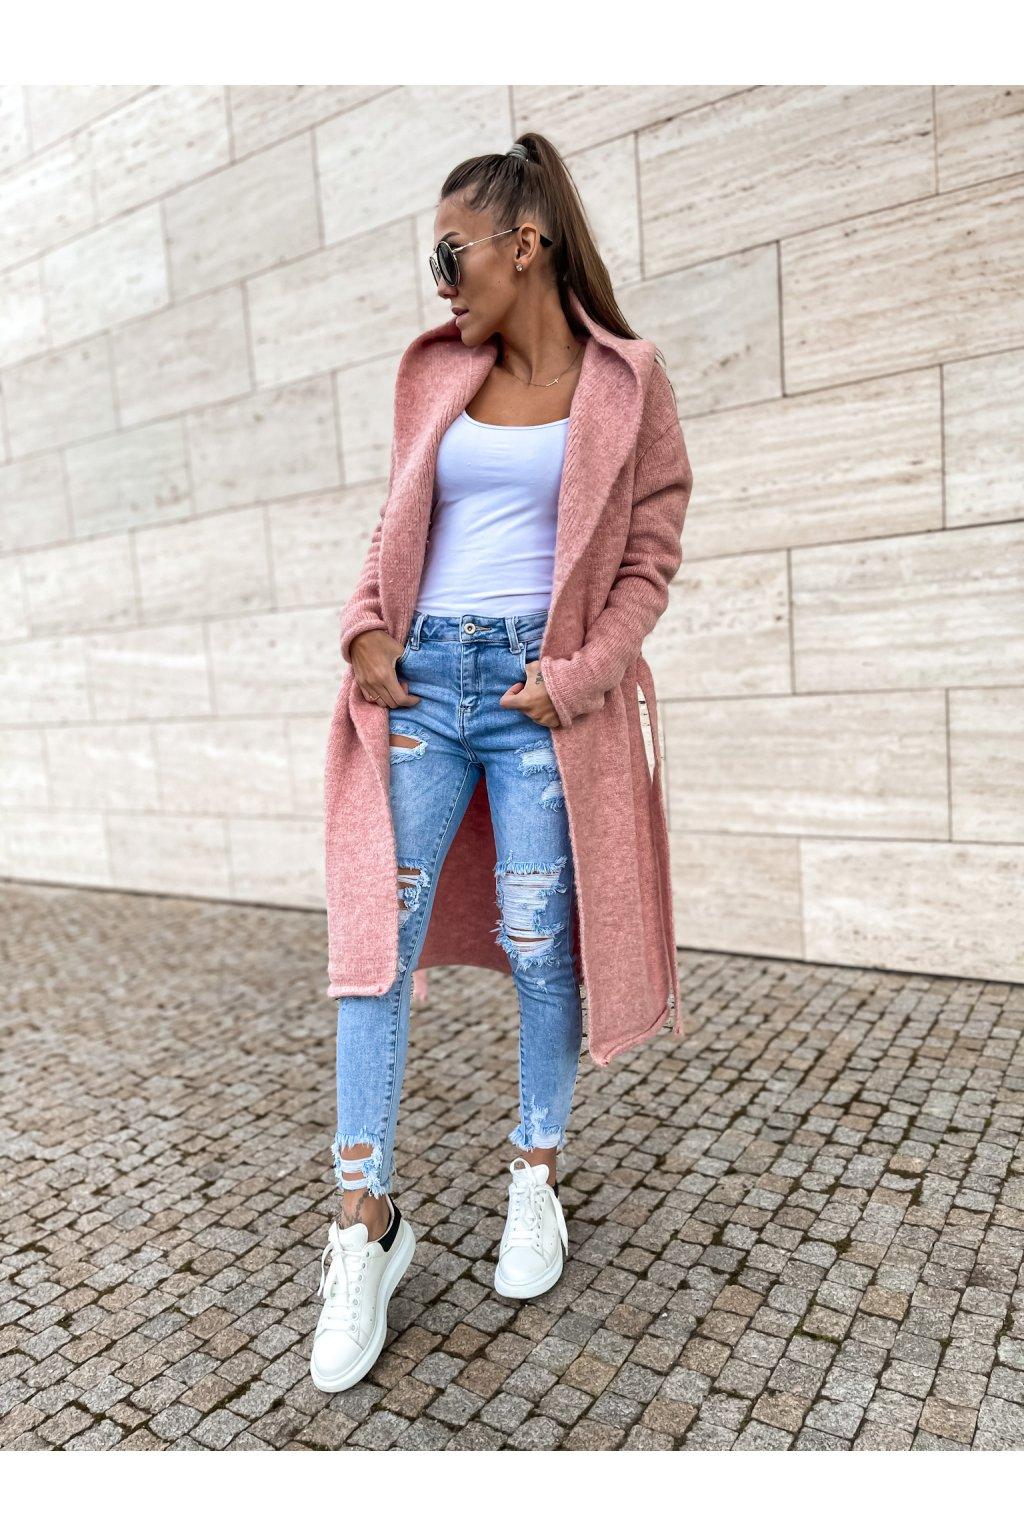 damsky cardigan s kapuci long powder pink eshopat cz 3